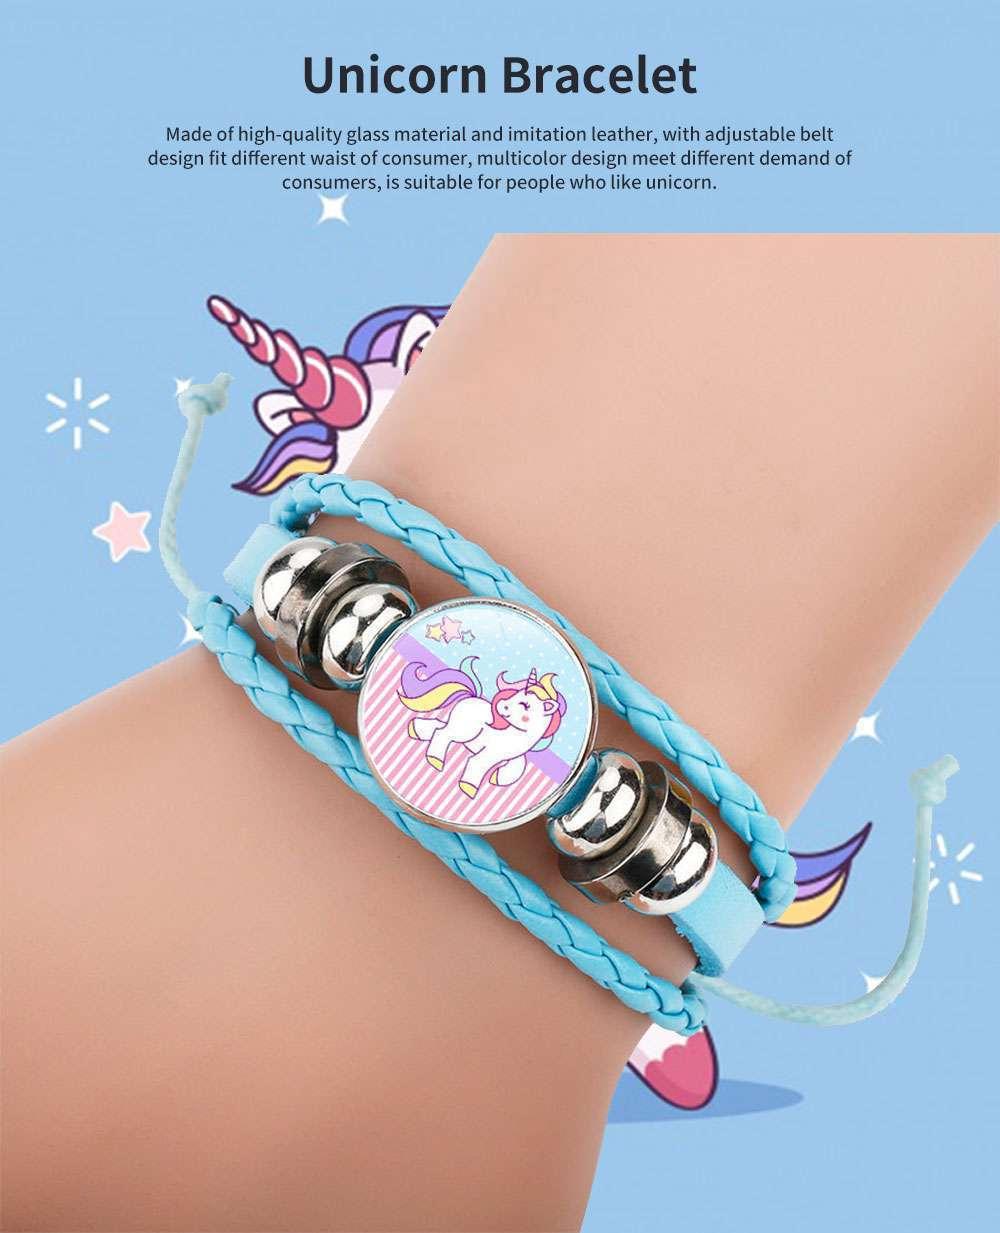 Unicorn Bracelet Ornaments Glass Material Imitation Leather Adjustable Belt Hand Catenary 0